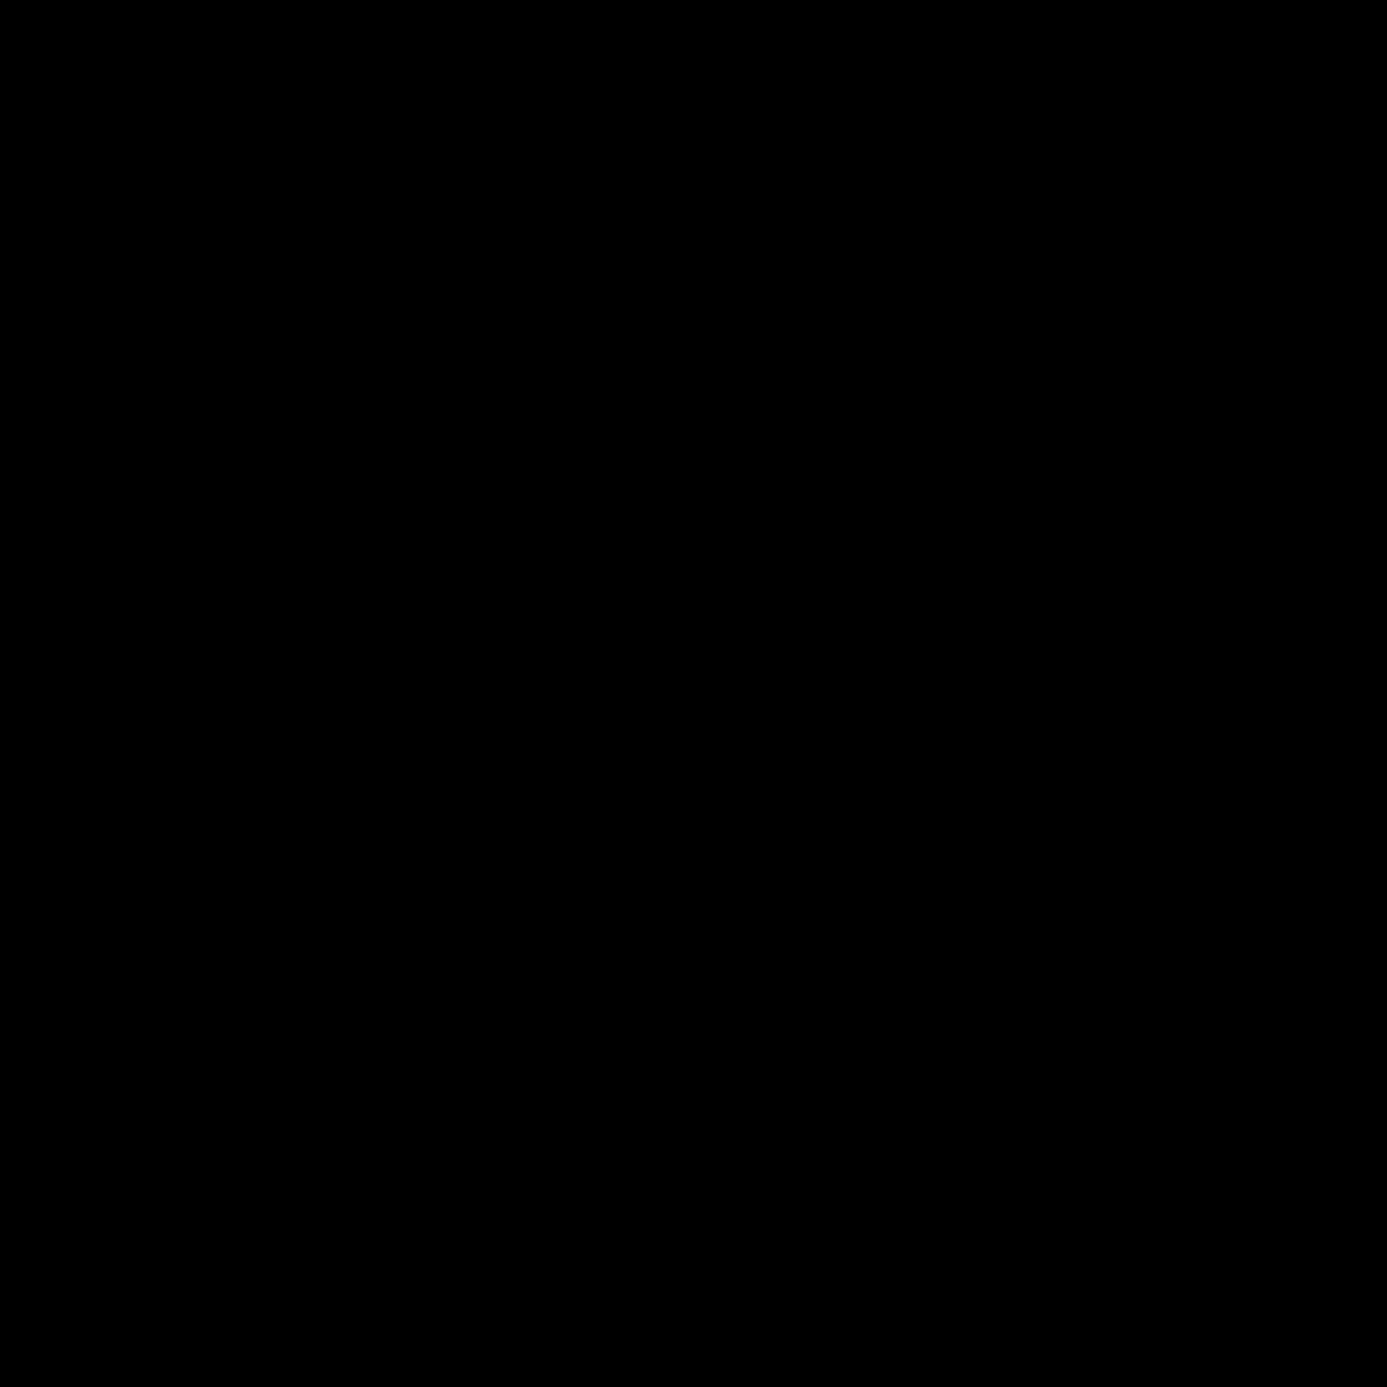 WYSSEN DEFENCE Ladehebel zu STGW90